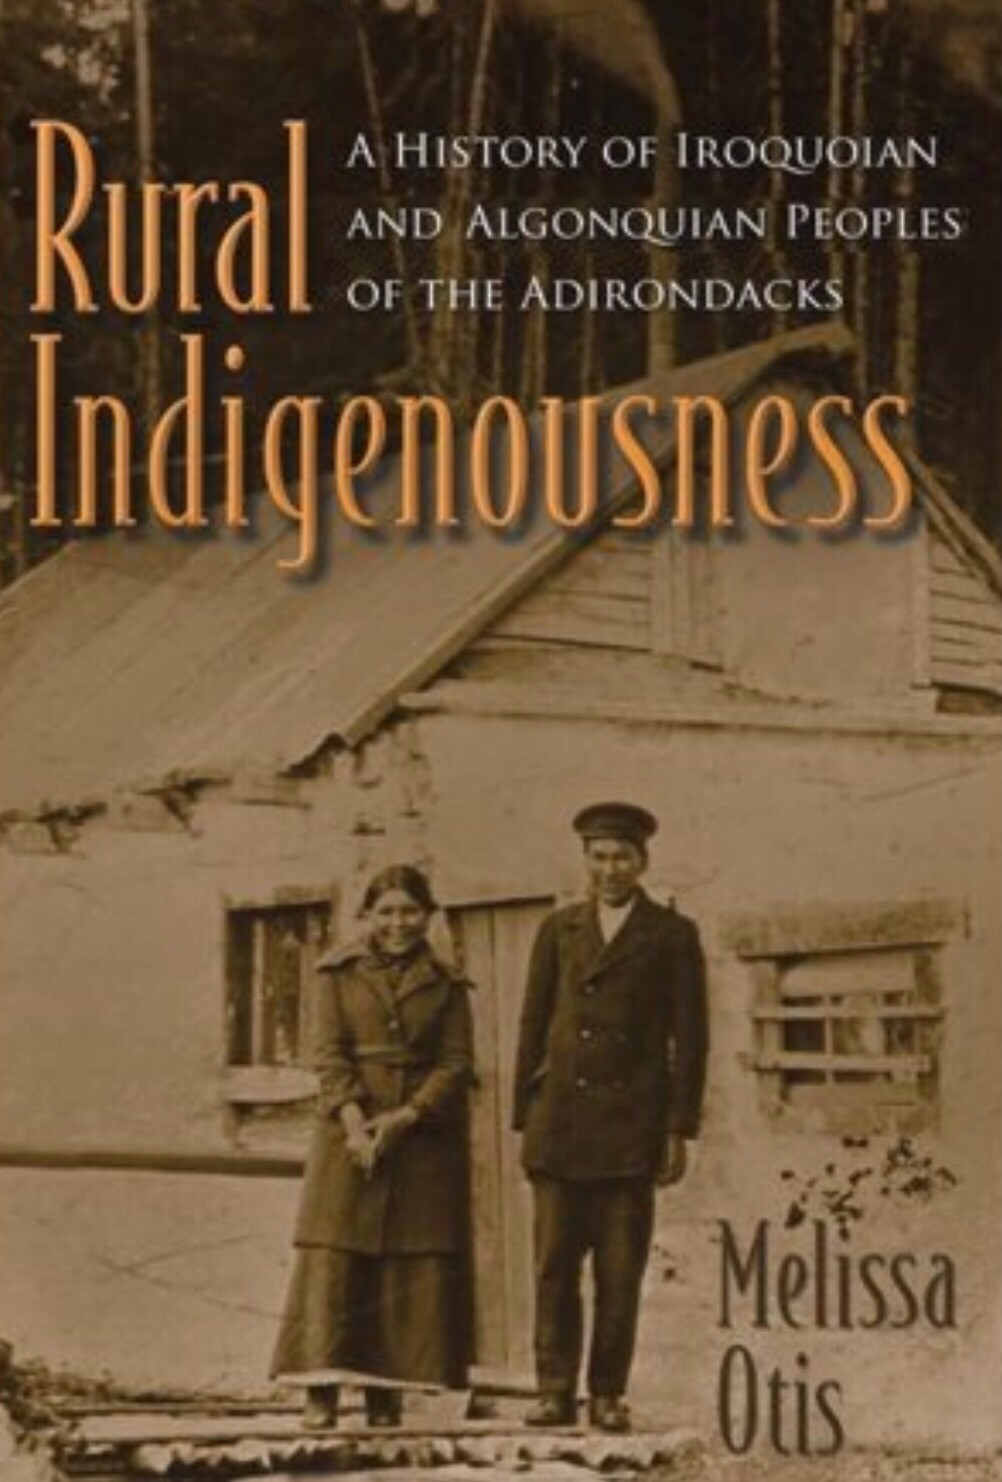 Rural Indigenousness - Melissa Otis